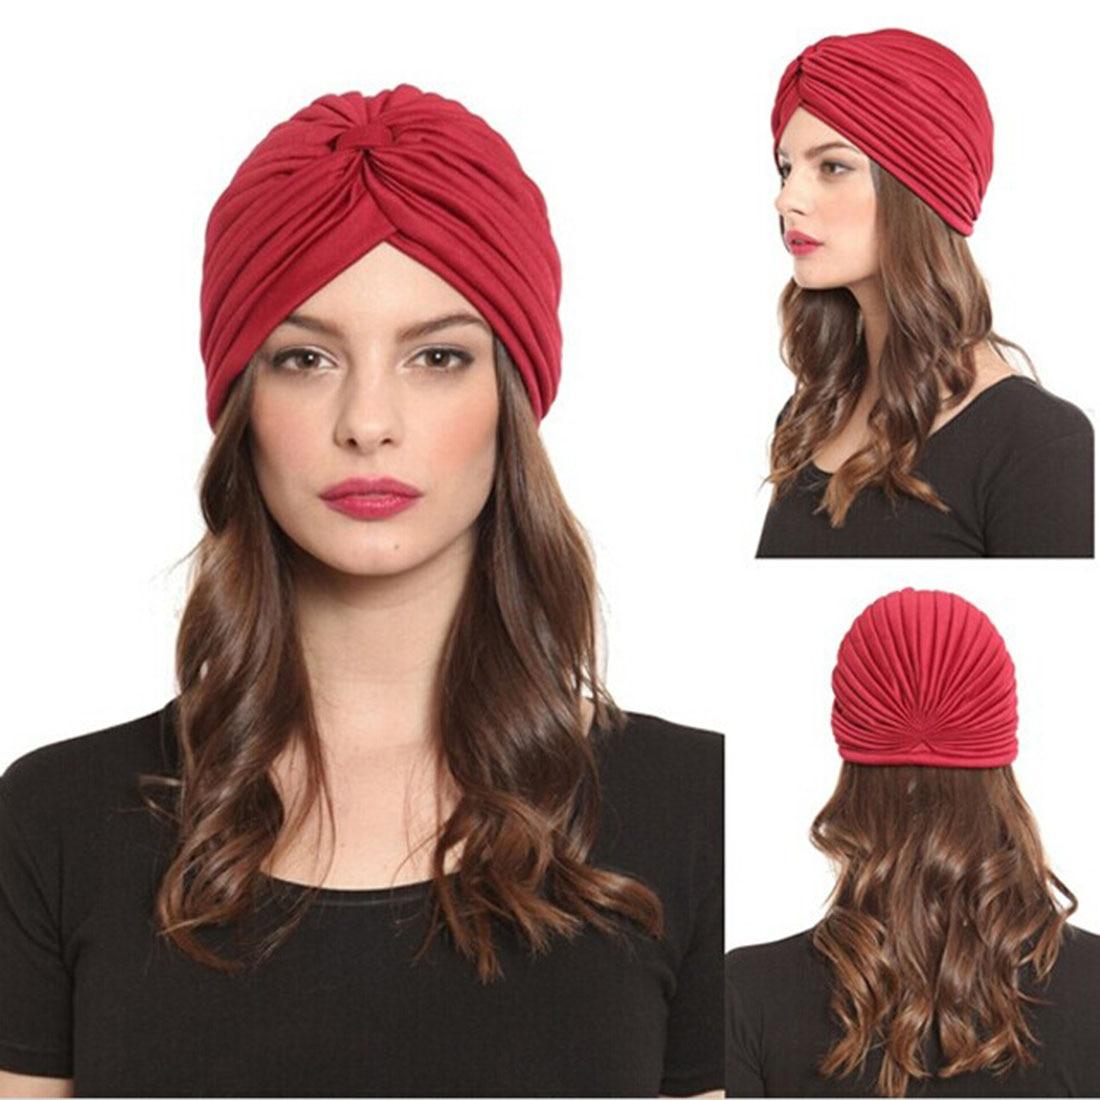 Stretchy Turban Muslim Hat Bandanas Headband Wrap Chemo Hijab Knotted Indian Cap Ethnic Solid Color Bandanas Harajuke Headwear